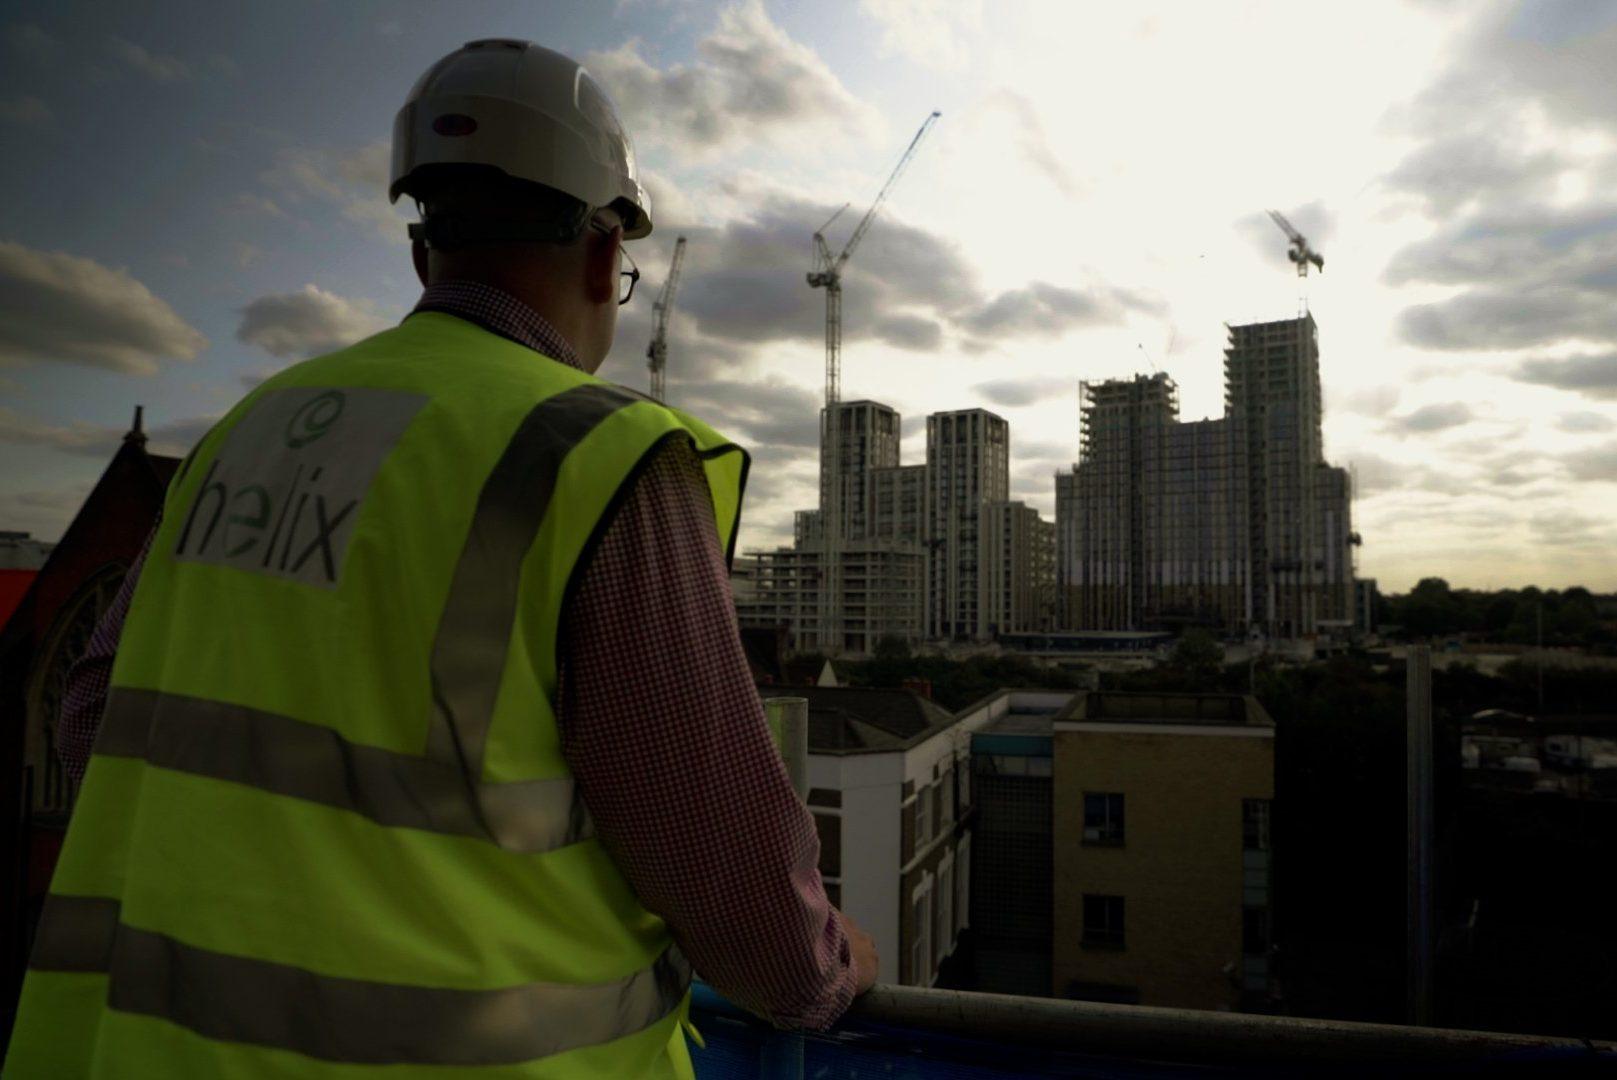 Helix - Chartered Builder